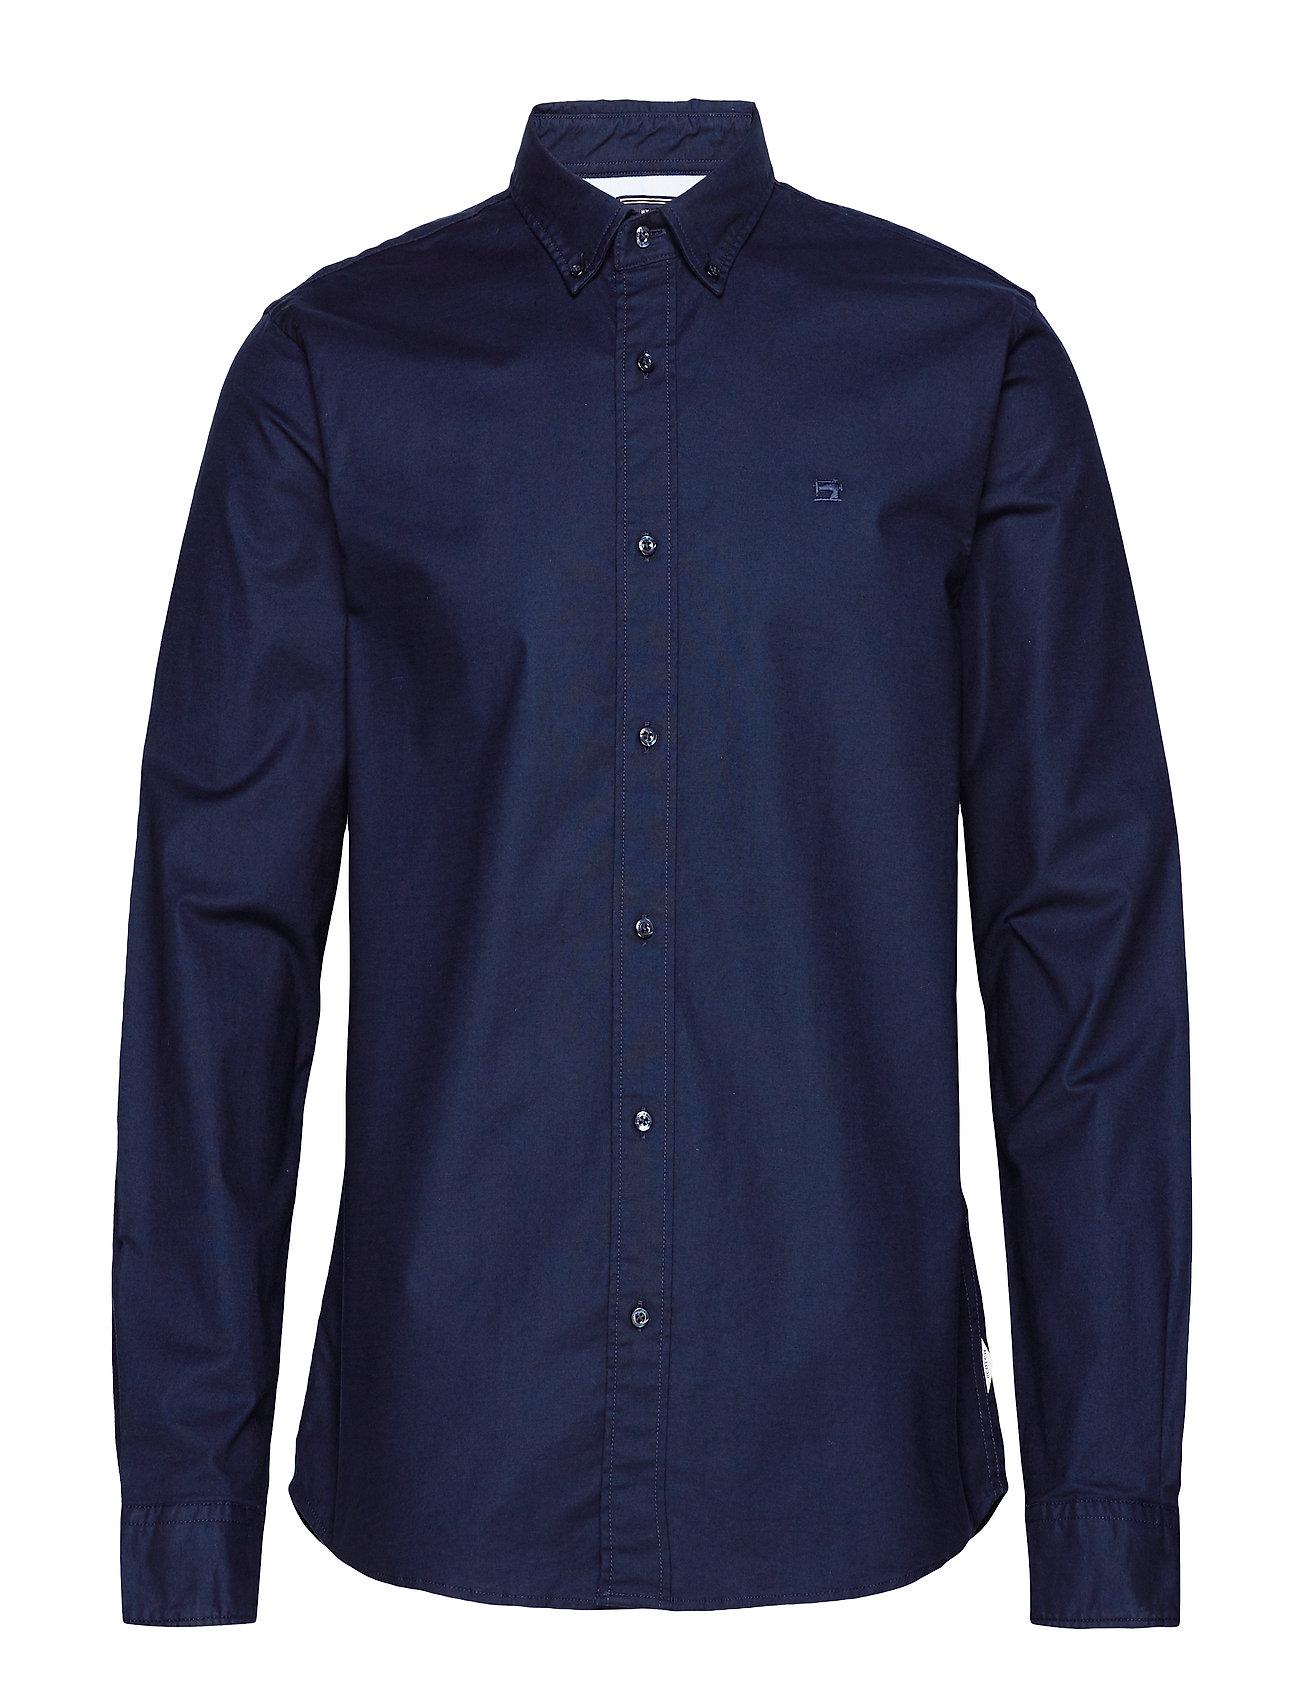 Scotch & Soda NOS Oxford shirt regular fit button down collar Ögrönlar